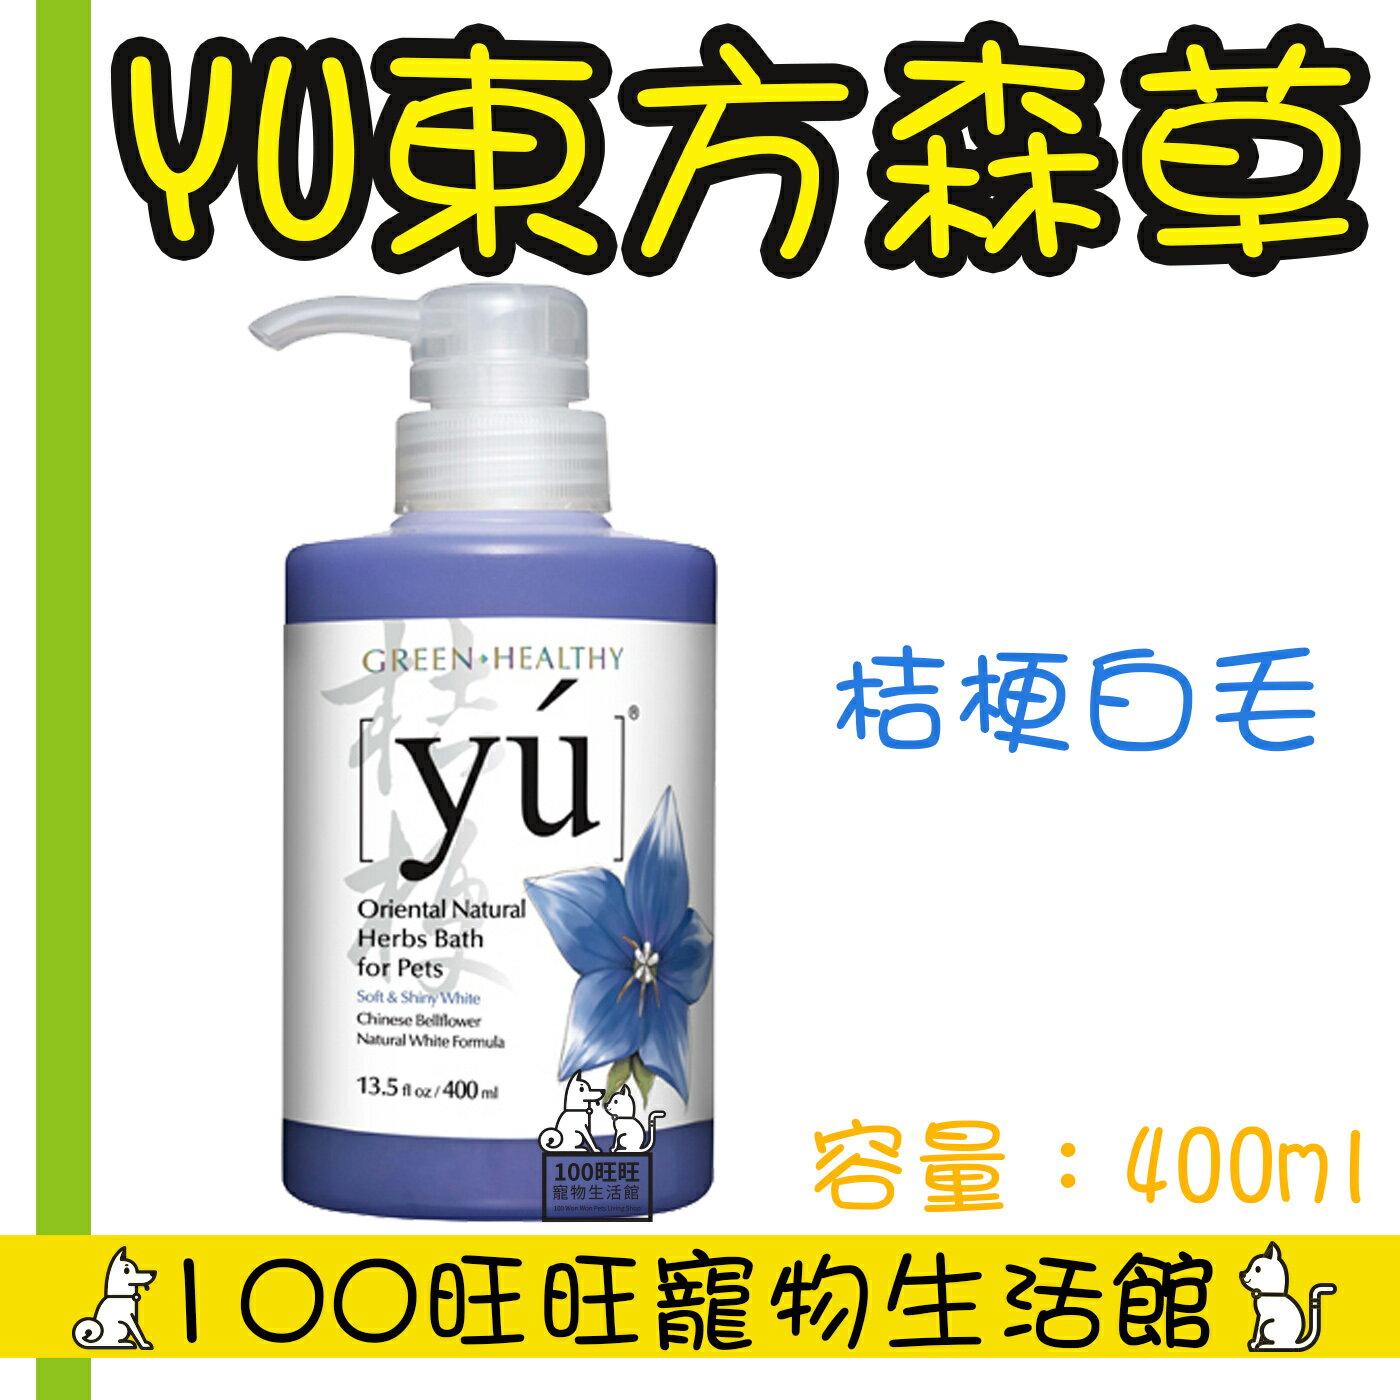 YU 東方森草寵物沐浴乳 含有機認證成分 桔梗白毛配方 400ml 寵物洗毛精